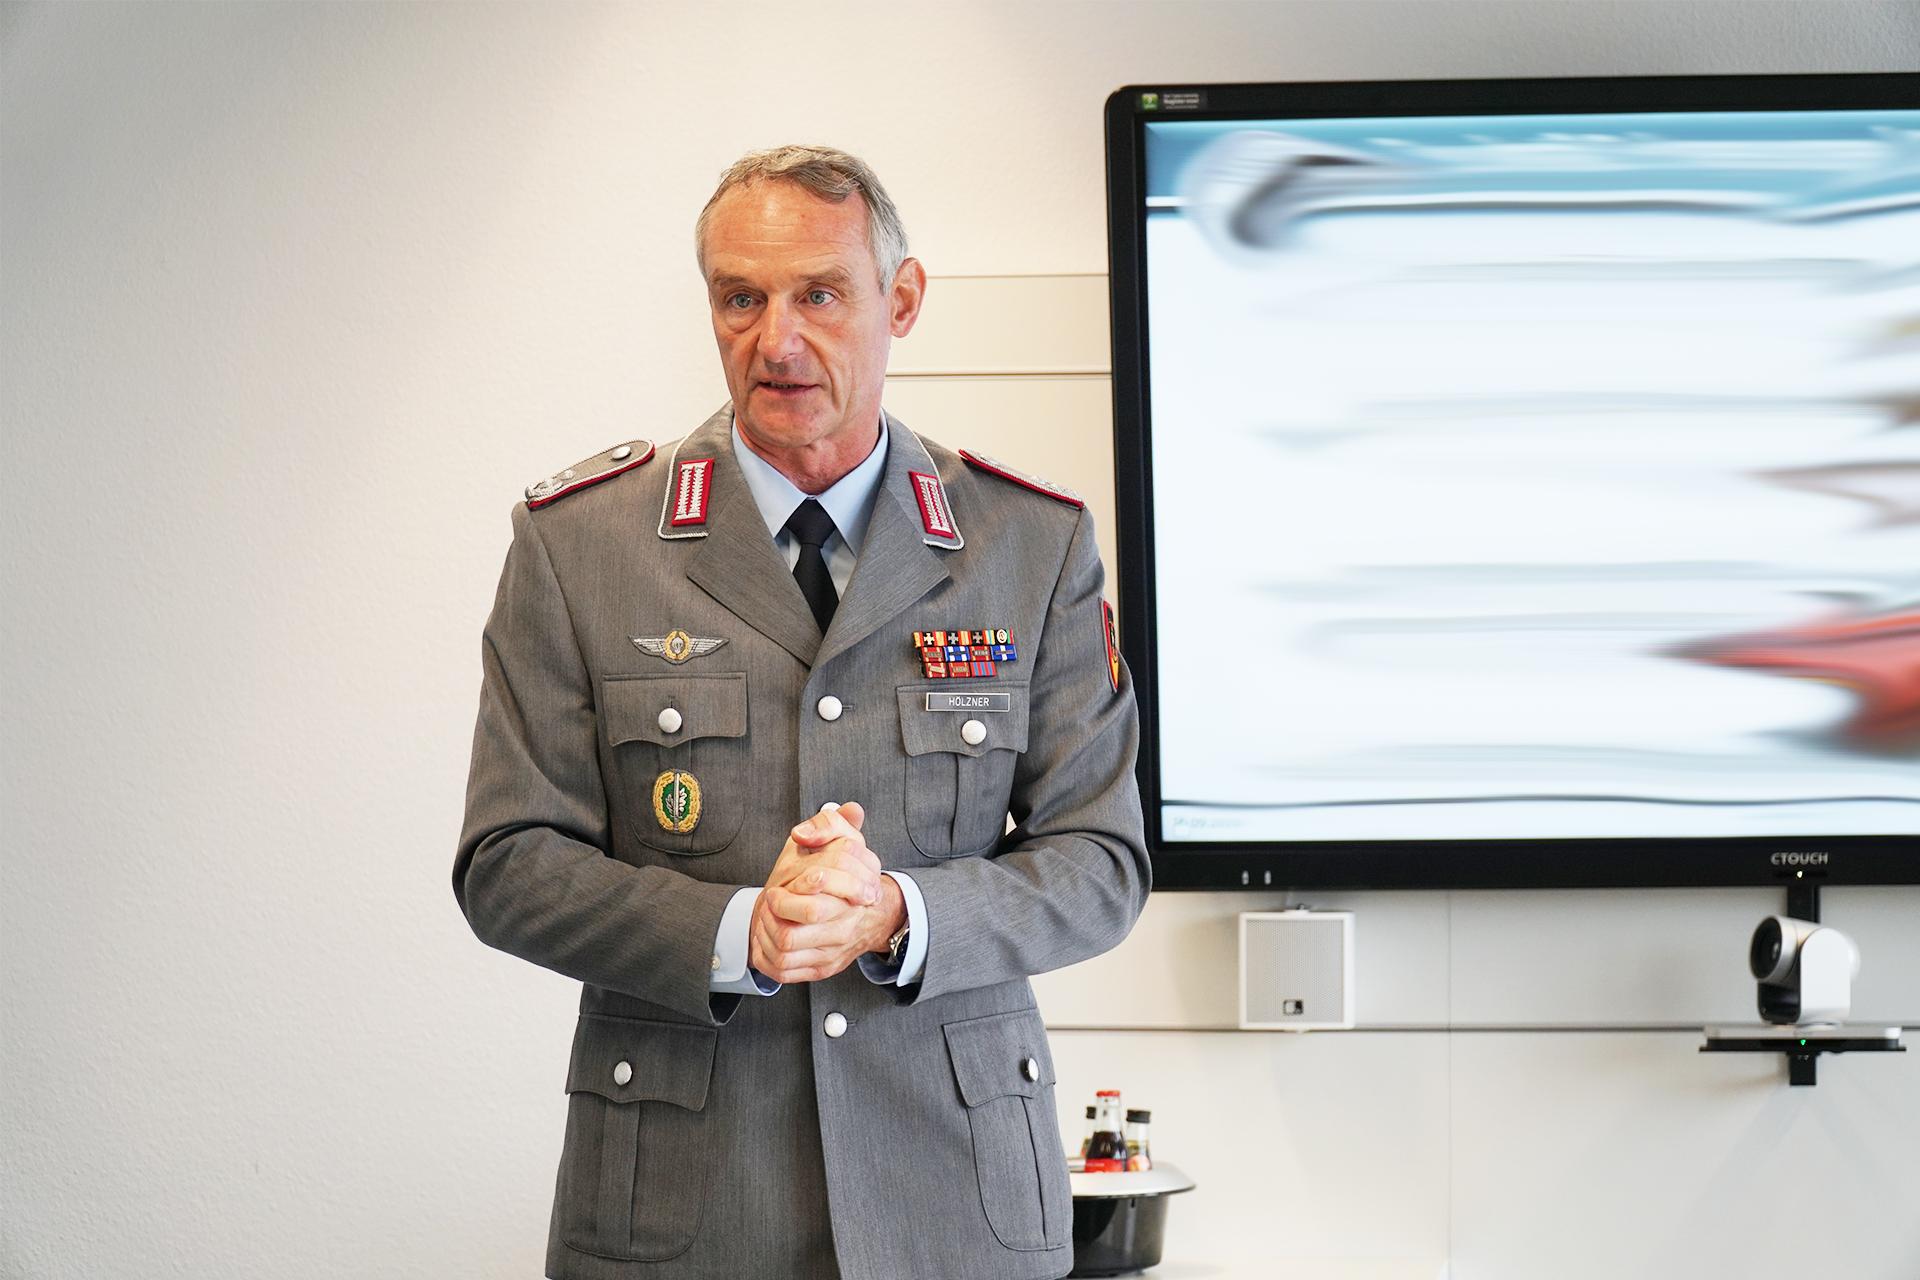 Oberstleutnant i.G. Frank Hölzner